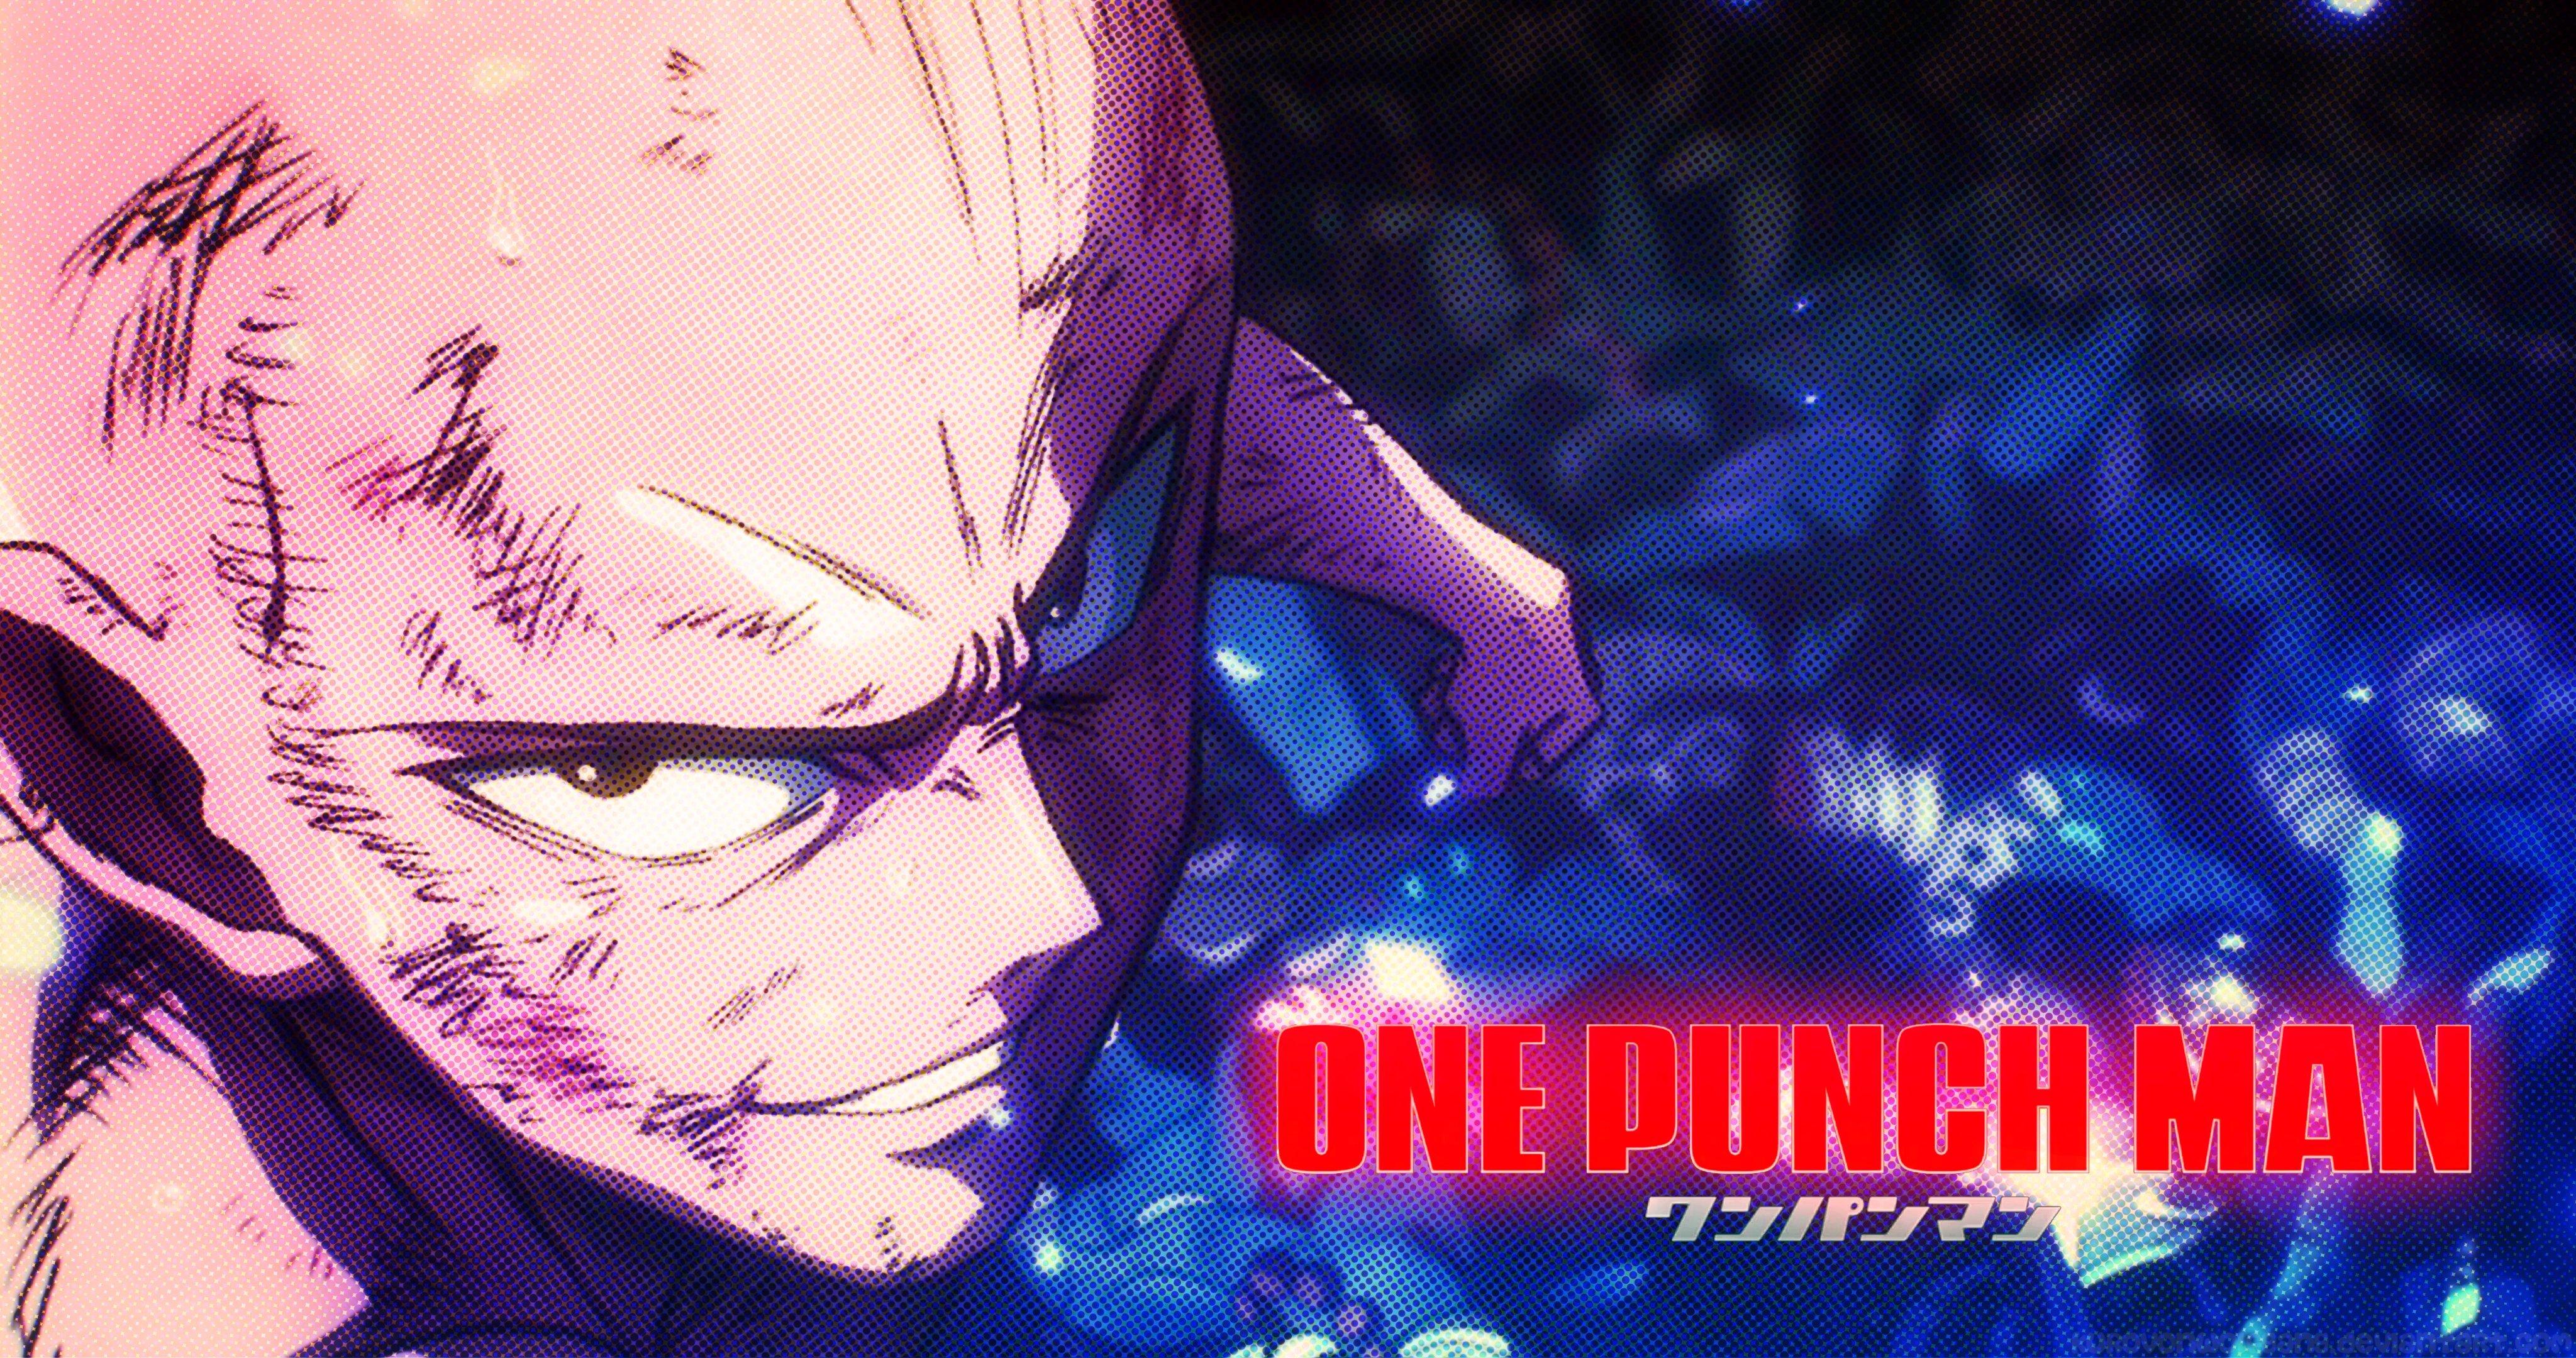 Saitama One Punch Man Anime Wallpaper Id 3215